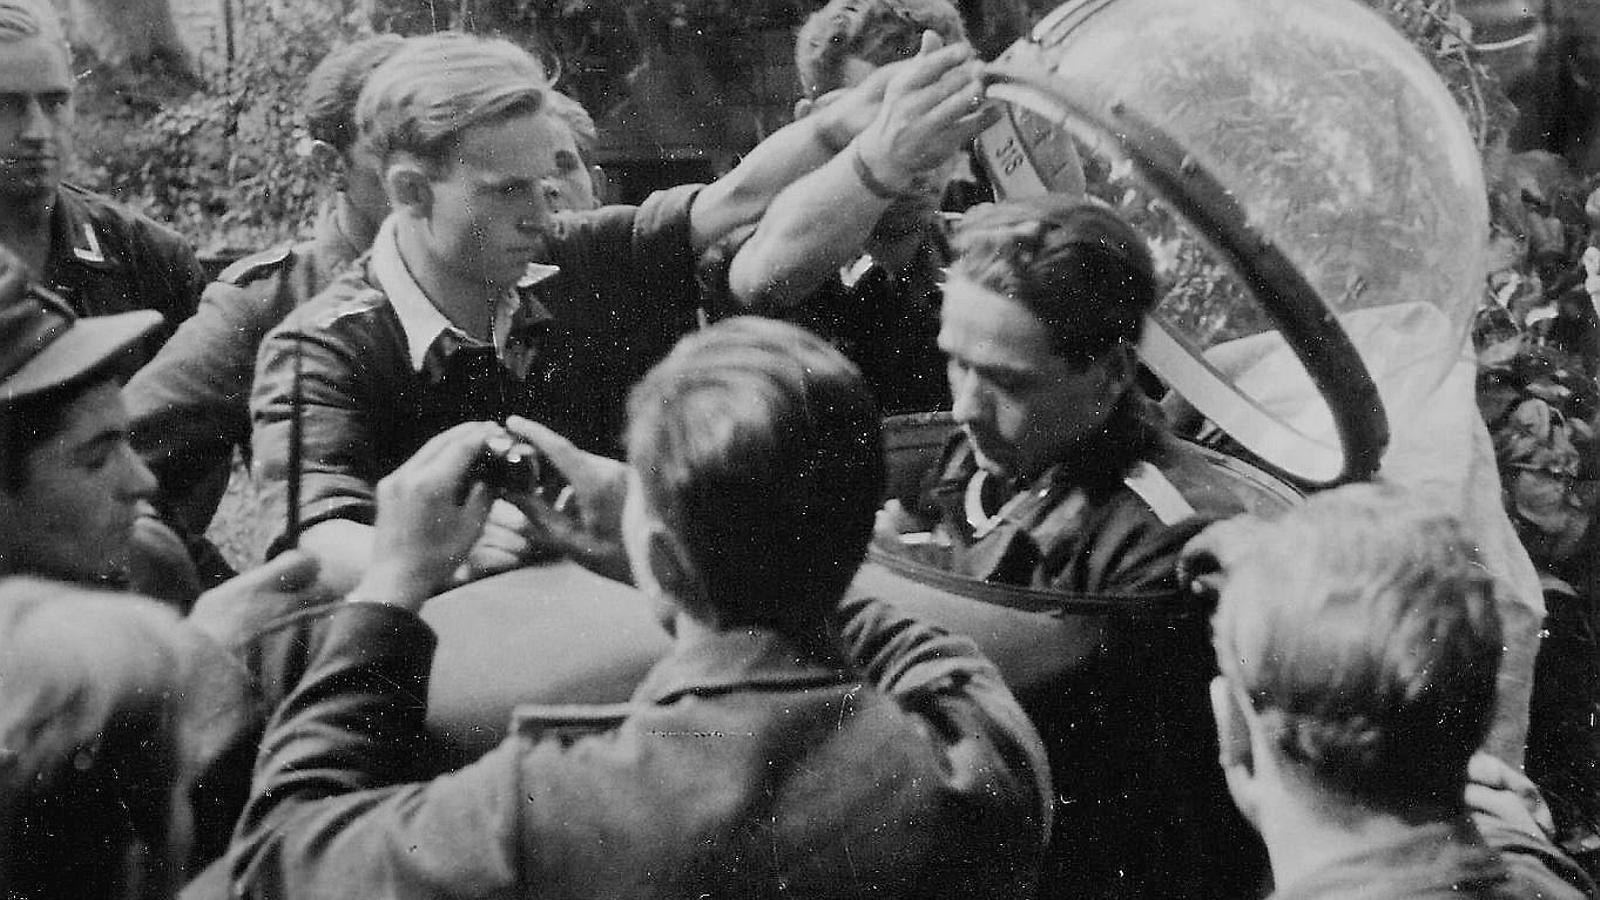 La dieta miracle del soldats nazis: ni pa ni llet, metamfetamines